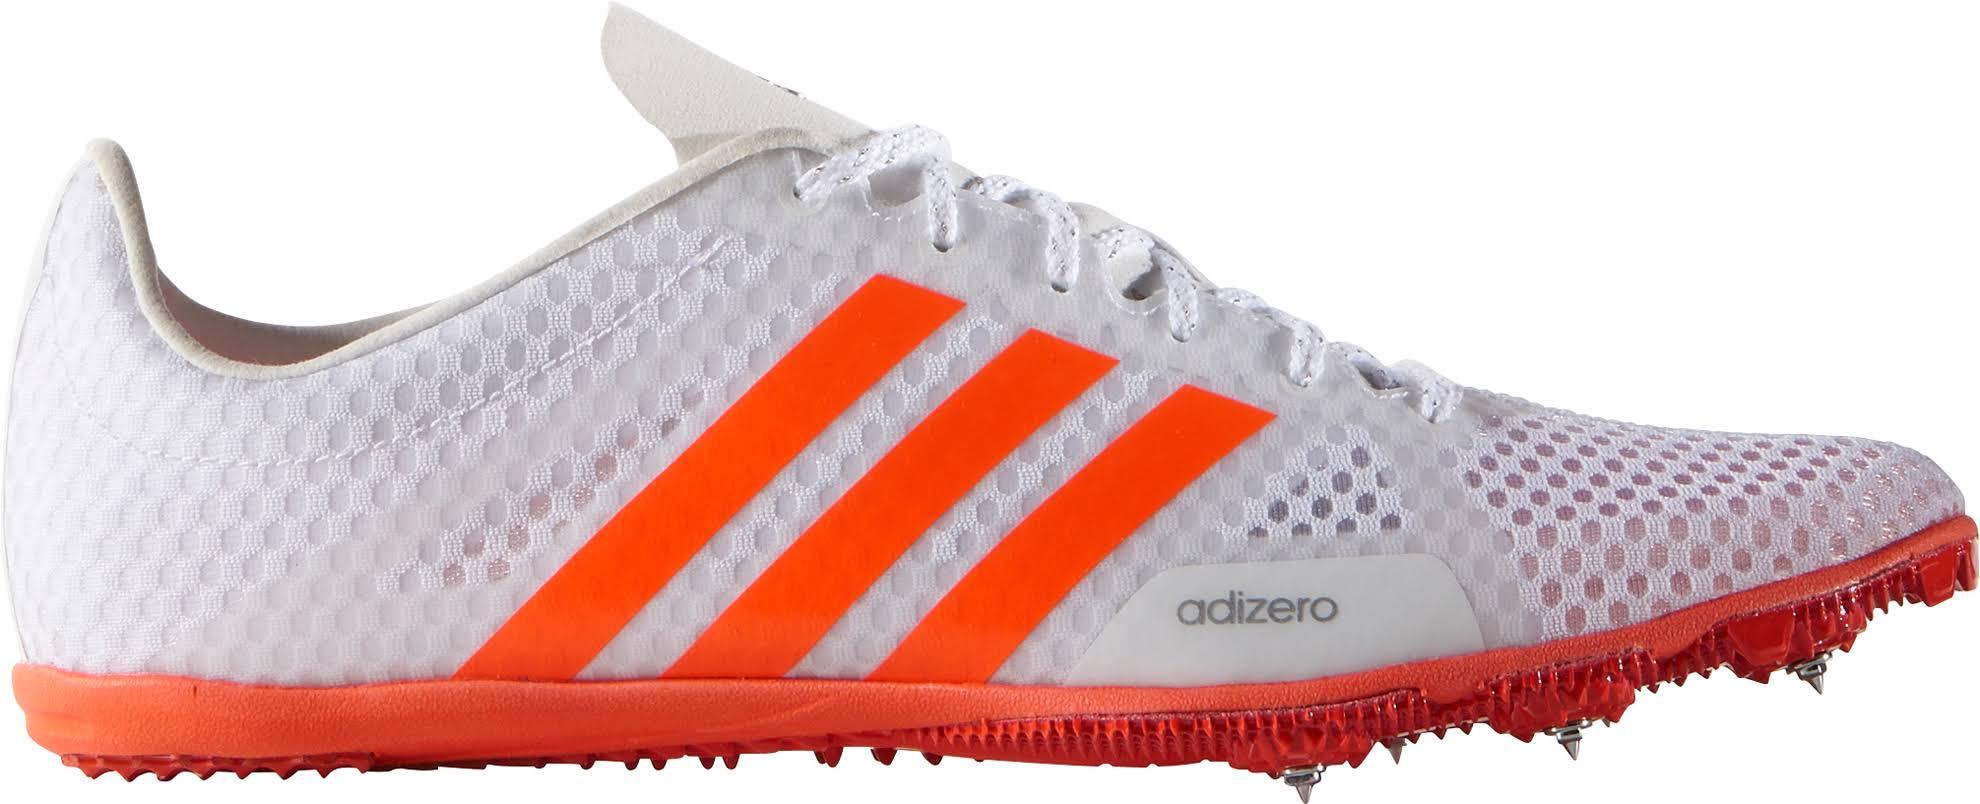 Corrientes Rio Blanco Ambition 3 Adidas Spikes Adizero WCyngp7X